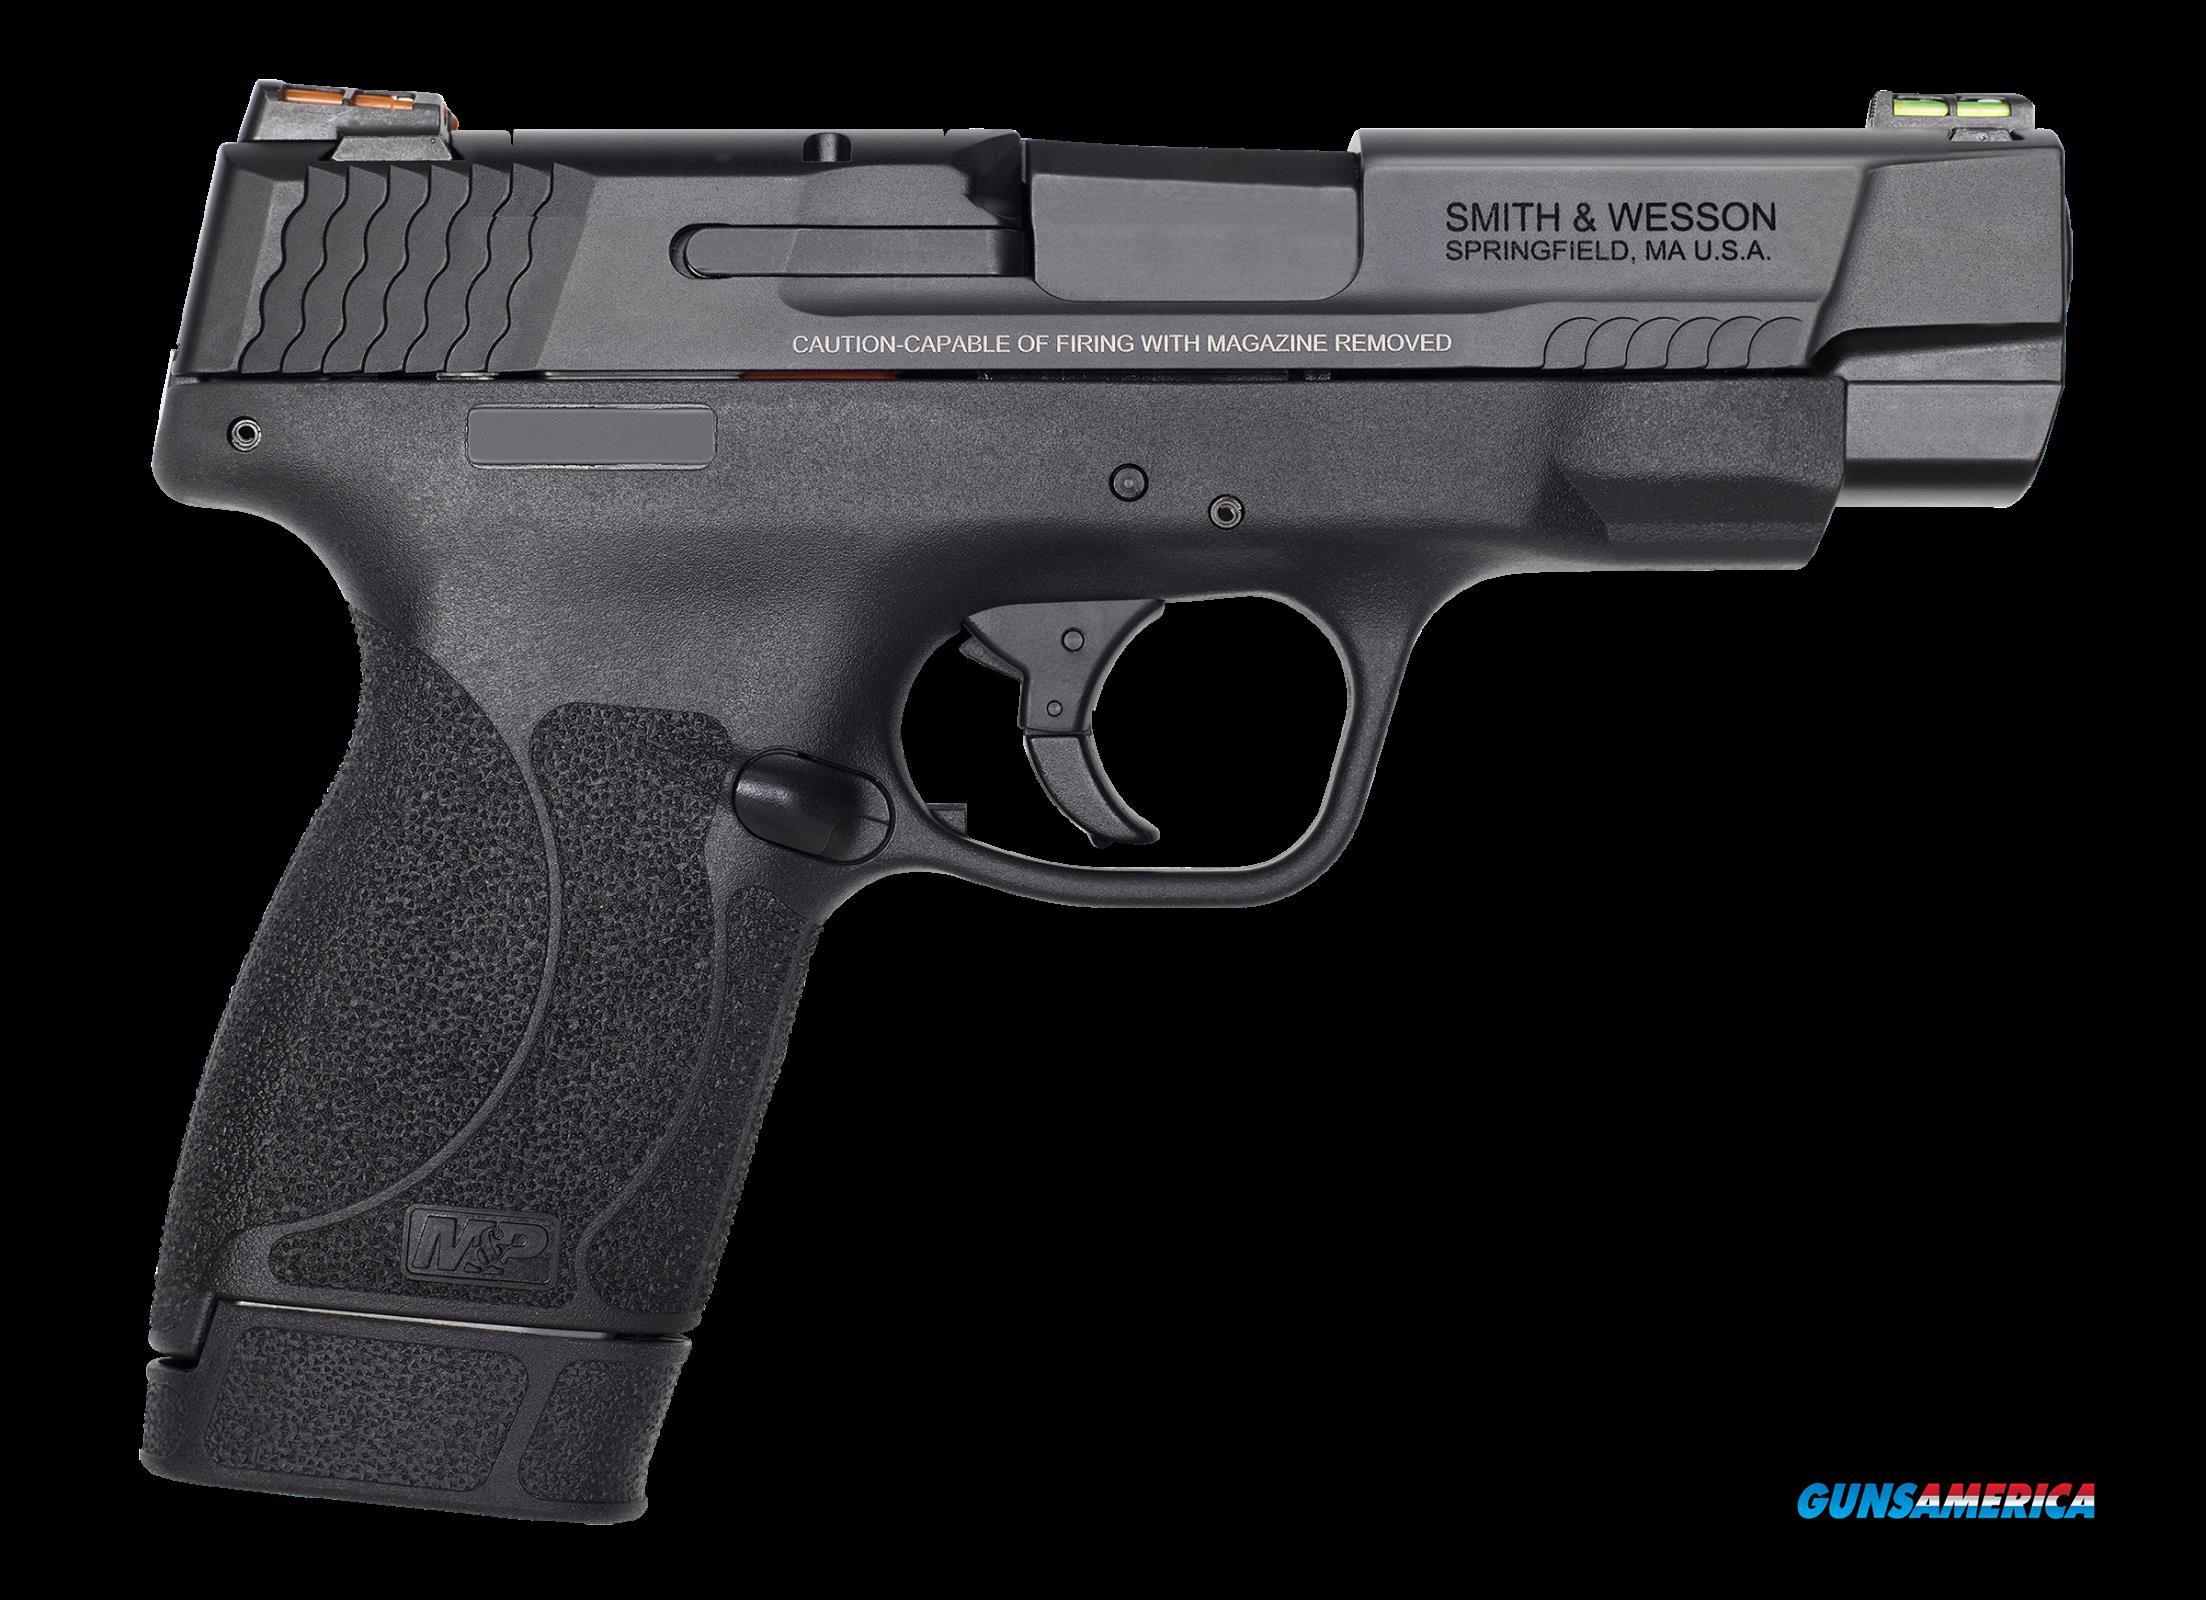 Smith & Wesson Performance Center, S&w M&p45shld  11864 Pfmc 45 2.0 4in Fo(gr-rd)7-6r  Guns > Pistols > 1911 Pistol Copies (non-Colt)